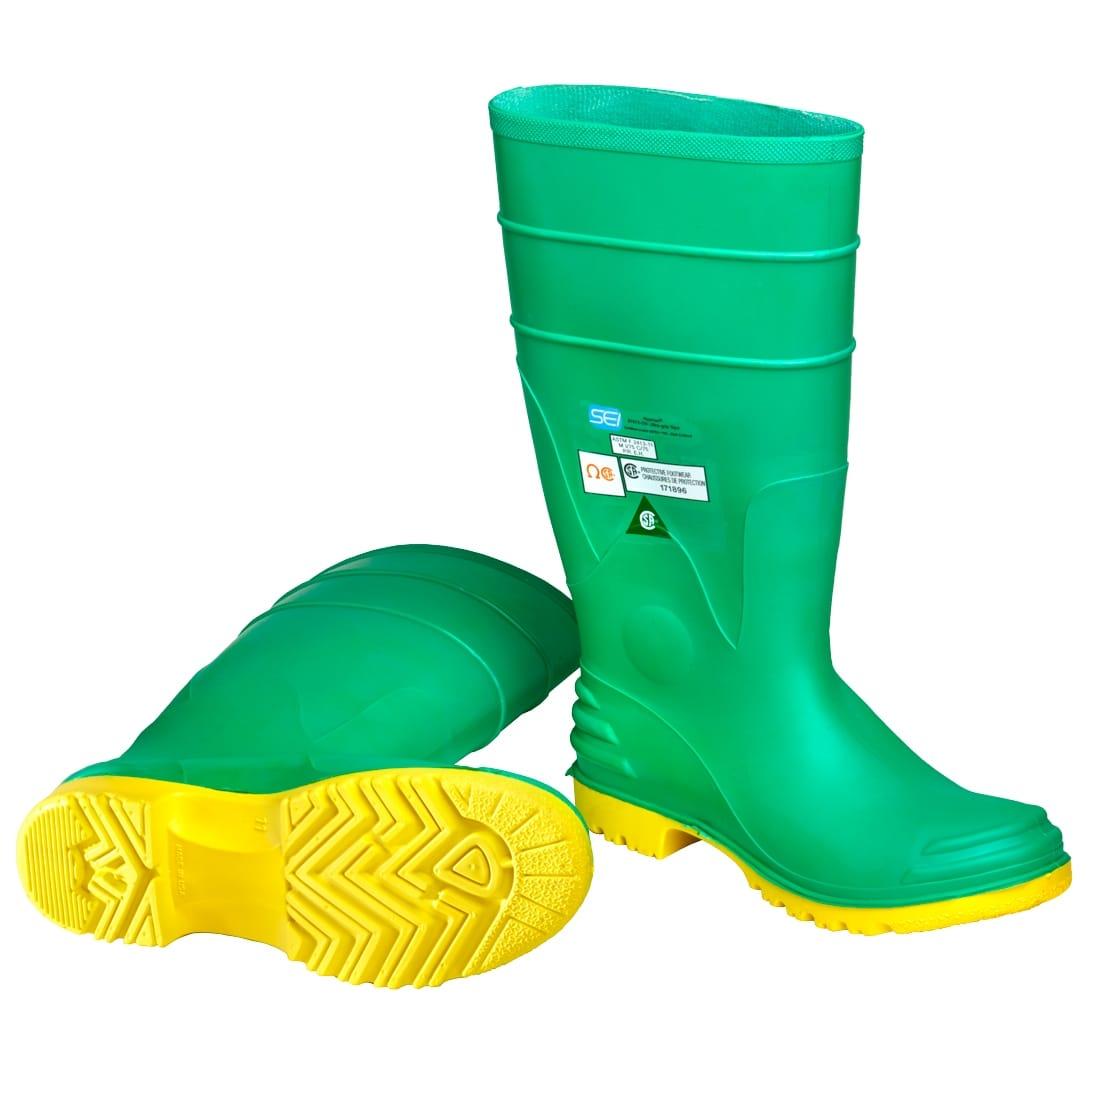 Hoods, Boots & Shoe Covers